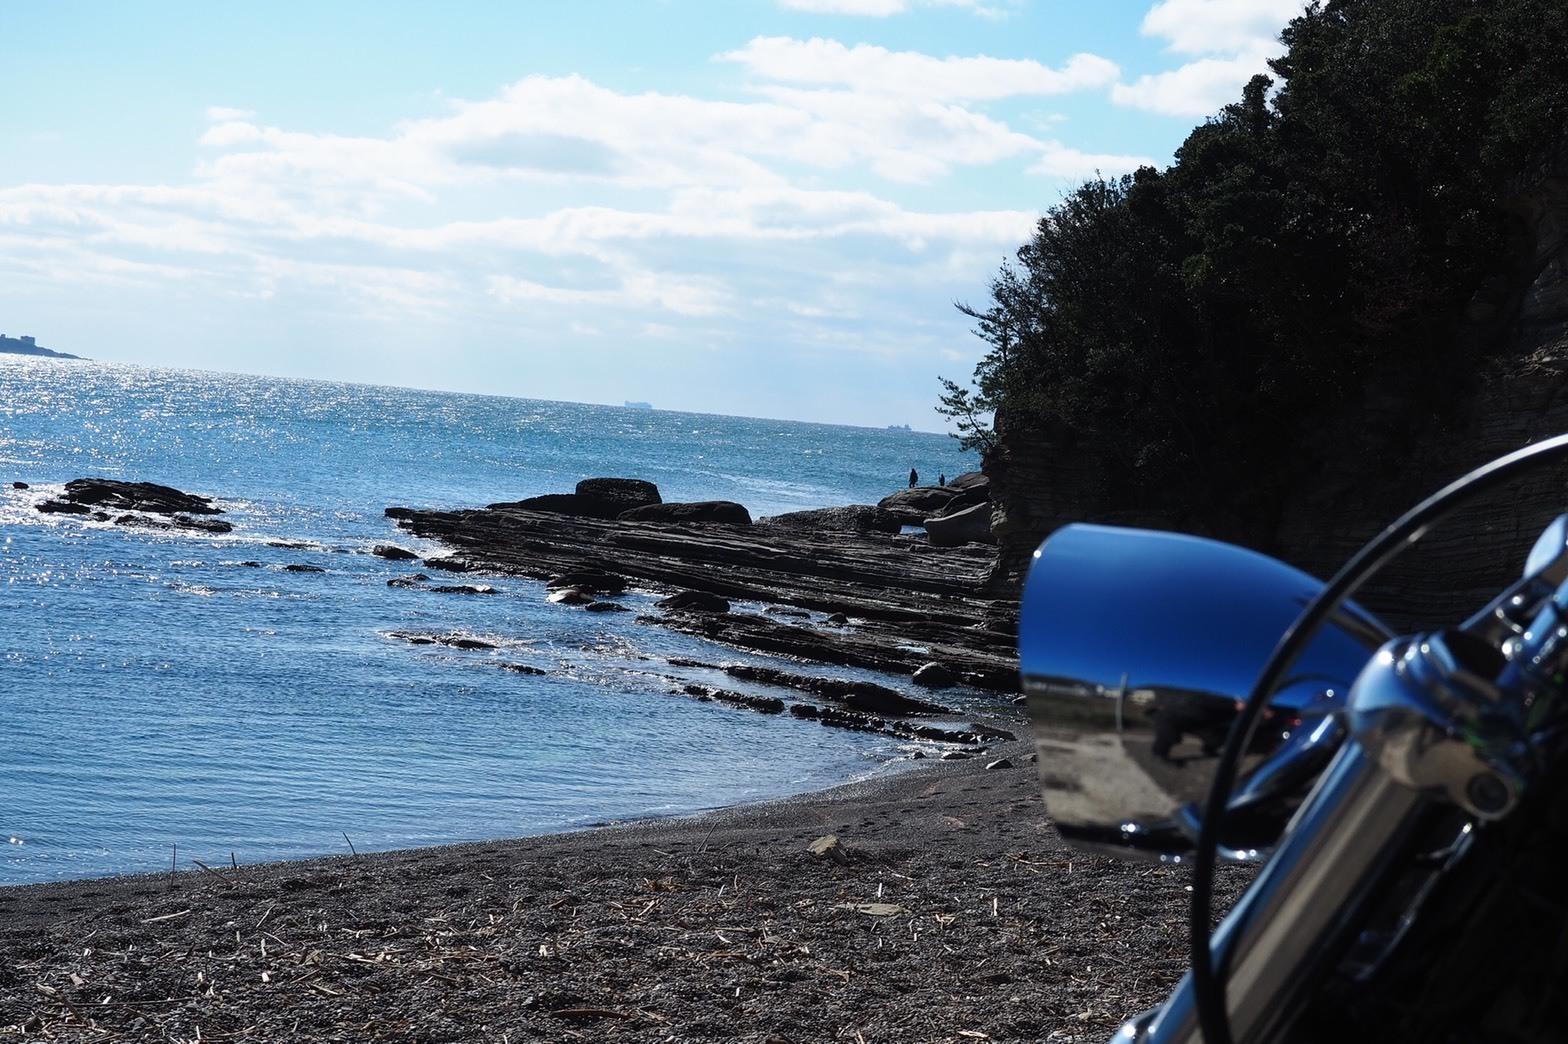 harleydavidson-motorcycle-touring-blog-wakayama-shigarami-beach-3.jpg